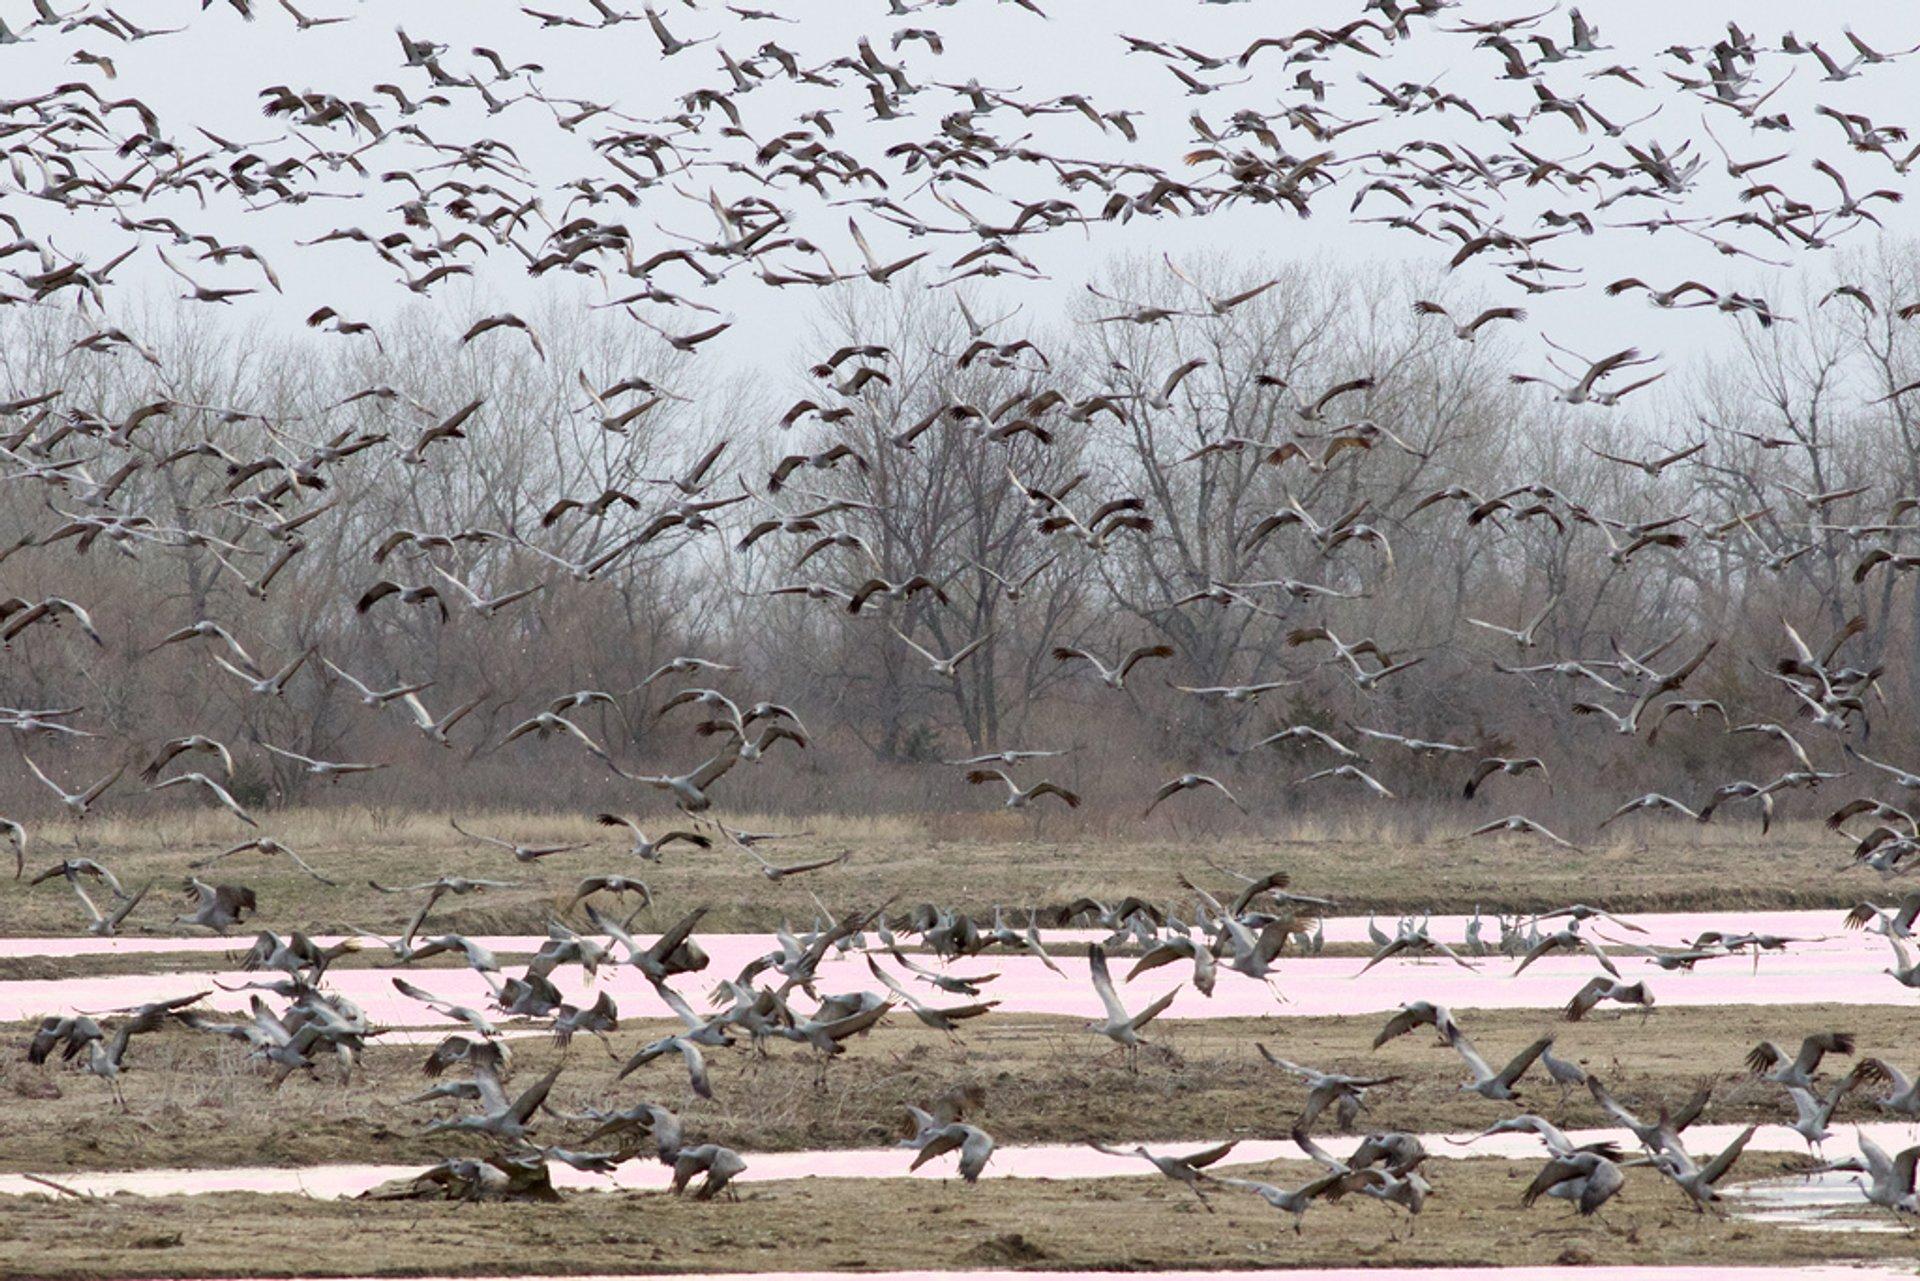 Sandhill Crane Migration in Midwest - Best Time